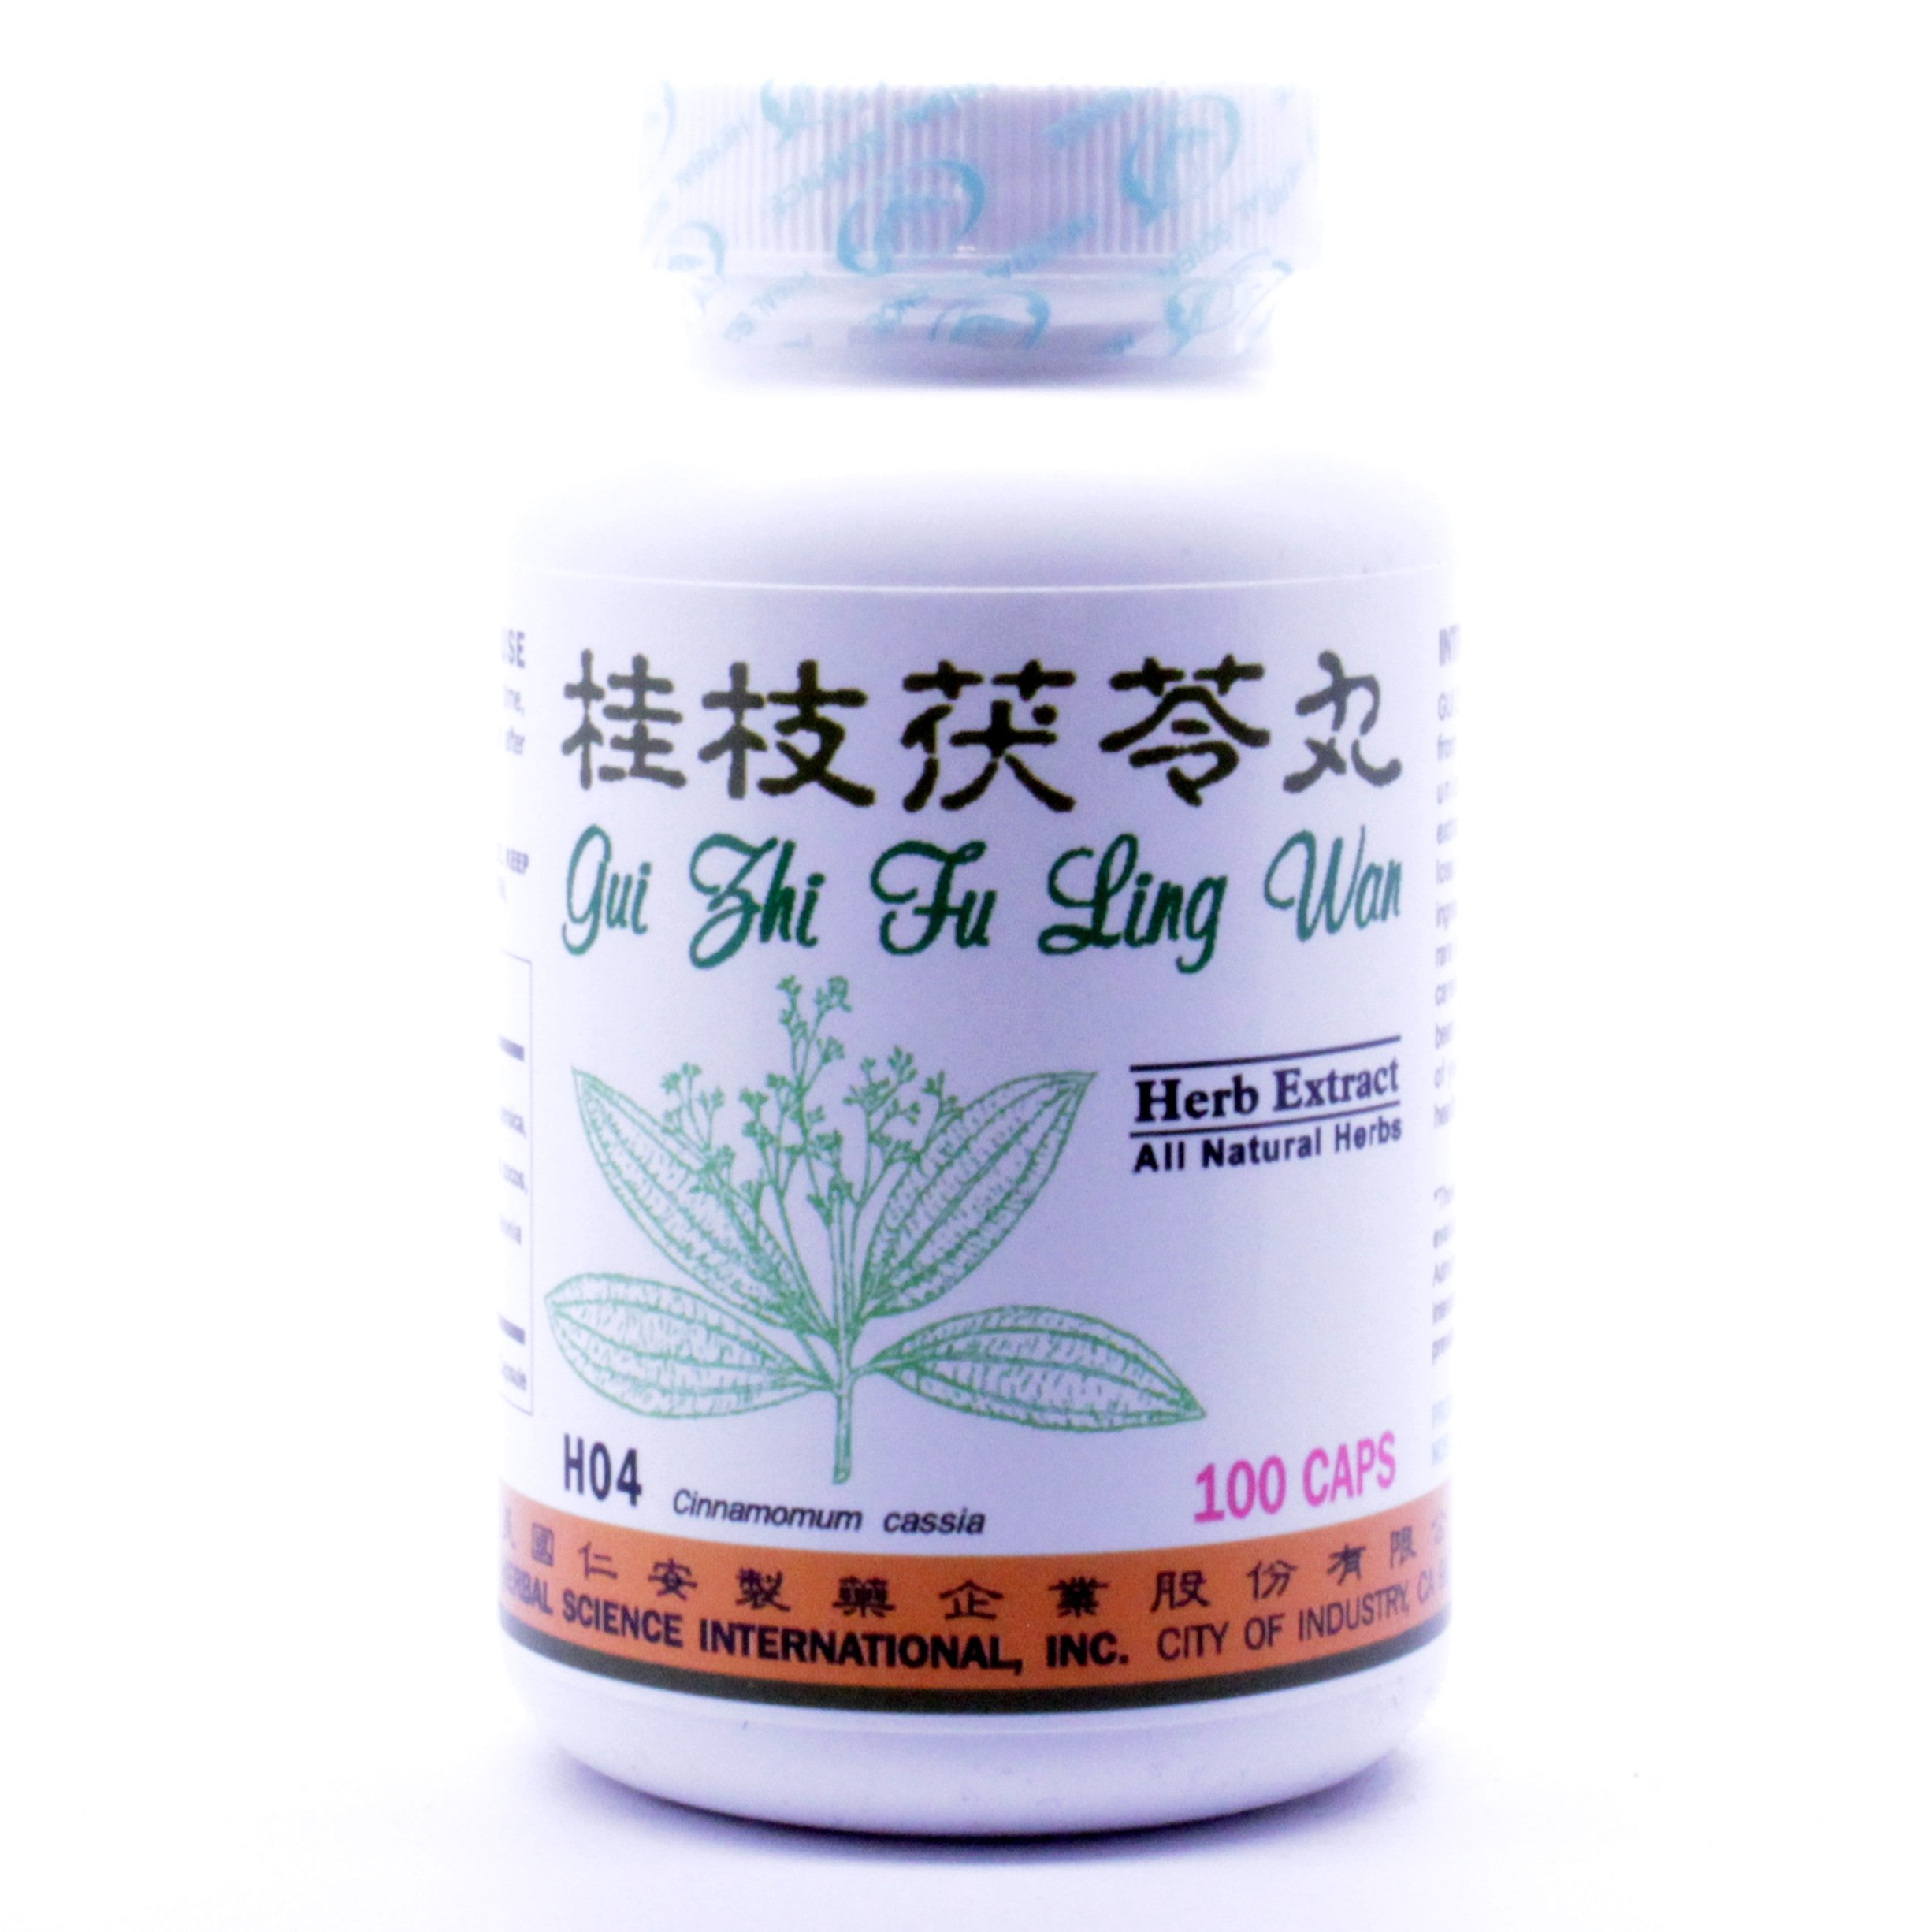 Cinnamon Poria Formula Dietary Supplement 500mg 100 capsules (Gui Zhi Fu Ling Wan,Cinnamon Twing & Poria Pill) 100% Natural Herbs